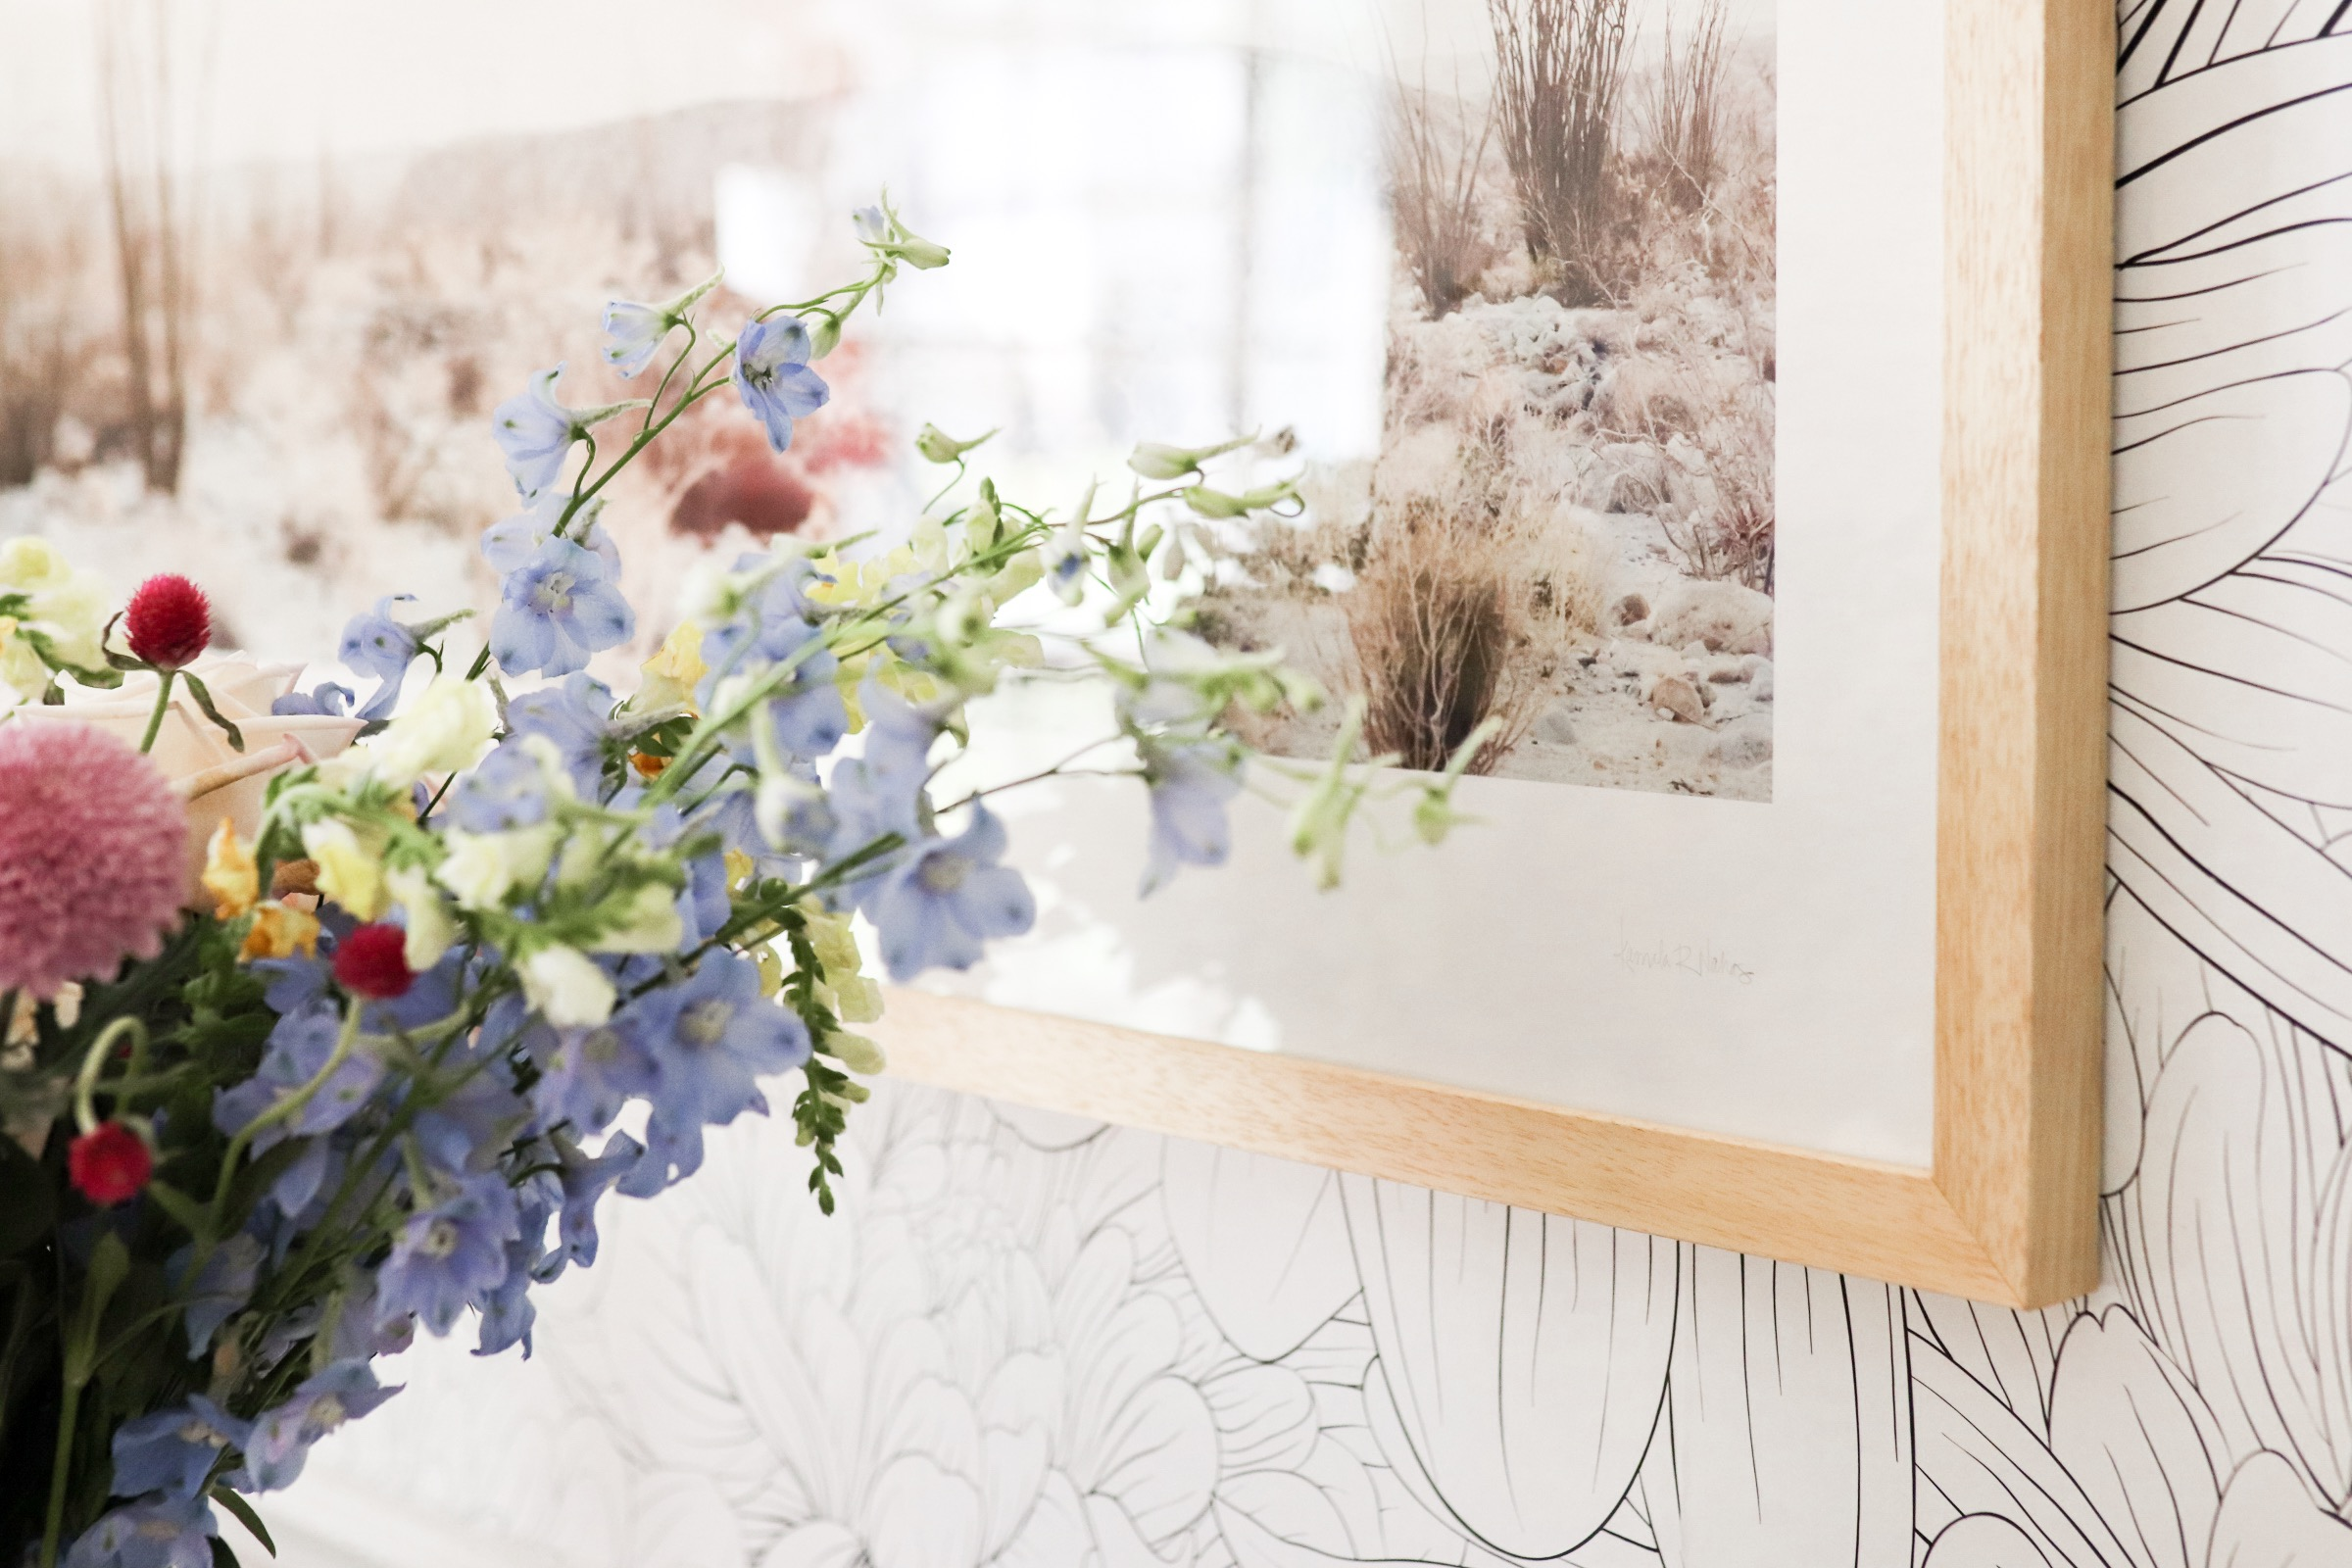 Home decor blogger Joyfullygreen wallpaper dining room makeover how to choose art with minted -11.jpg